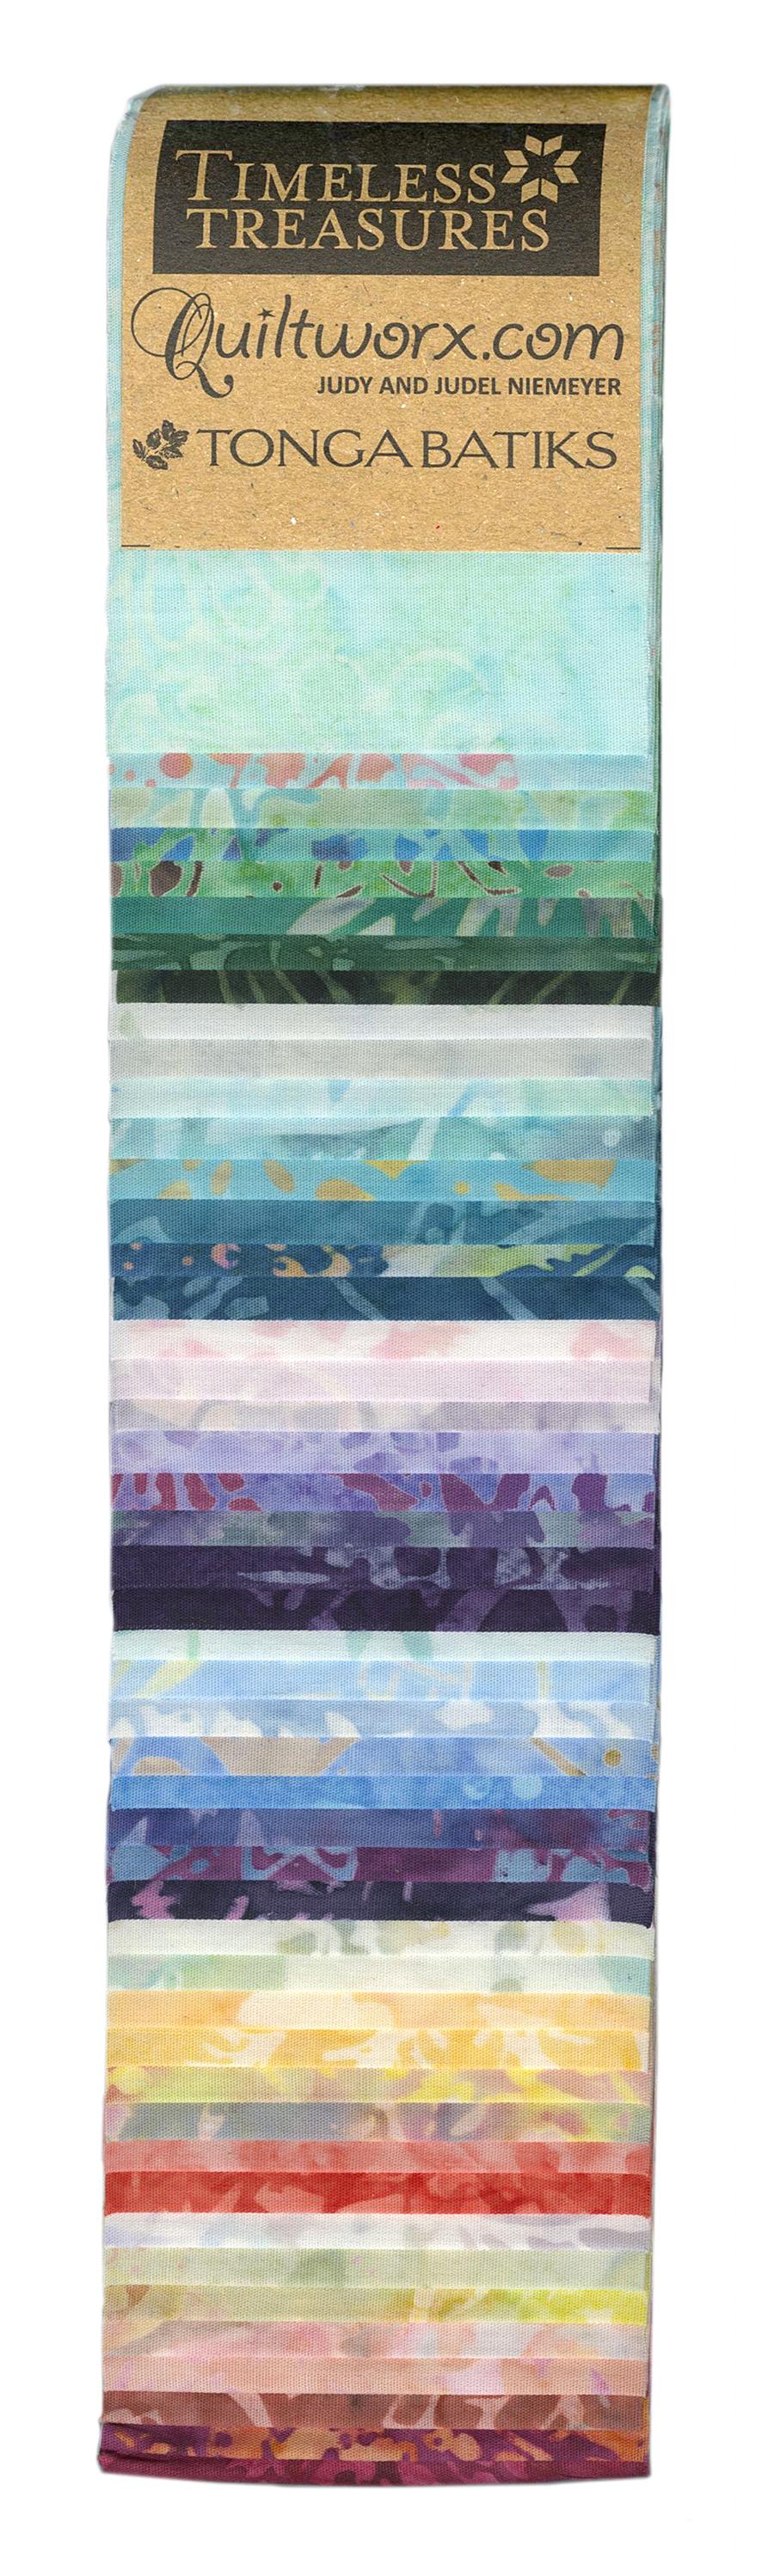 2-1/2 in Strips Tonga Batik<br>Taffy 48pcs/bundle